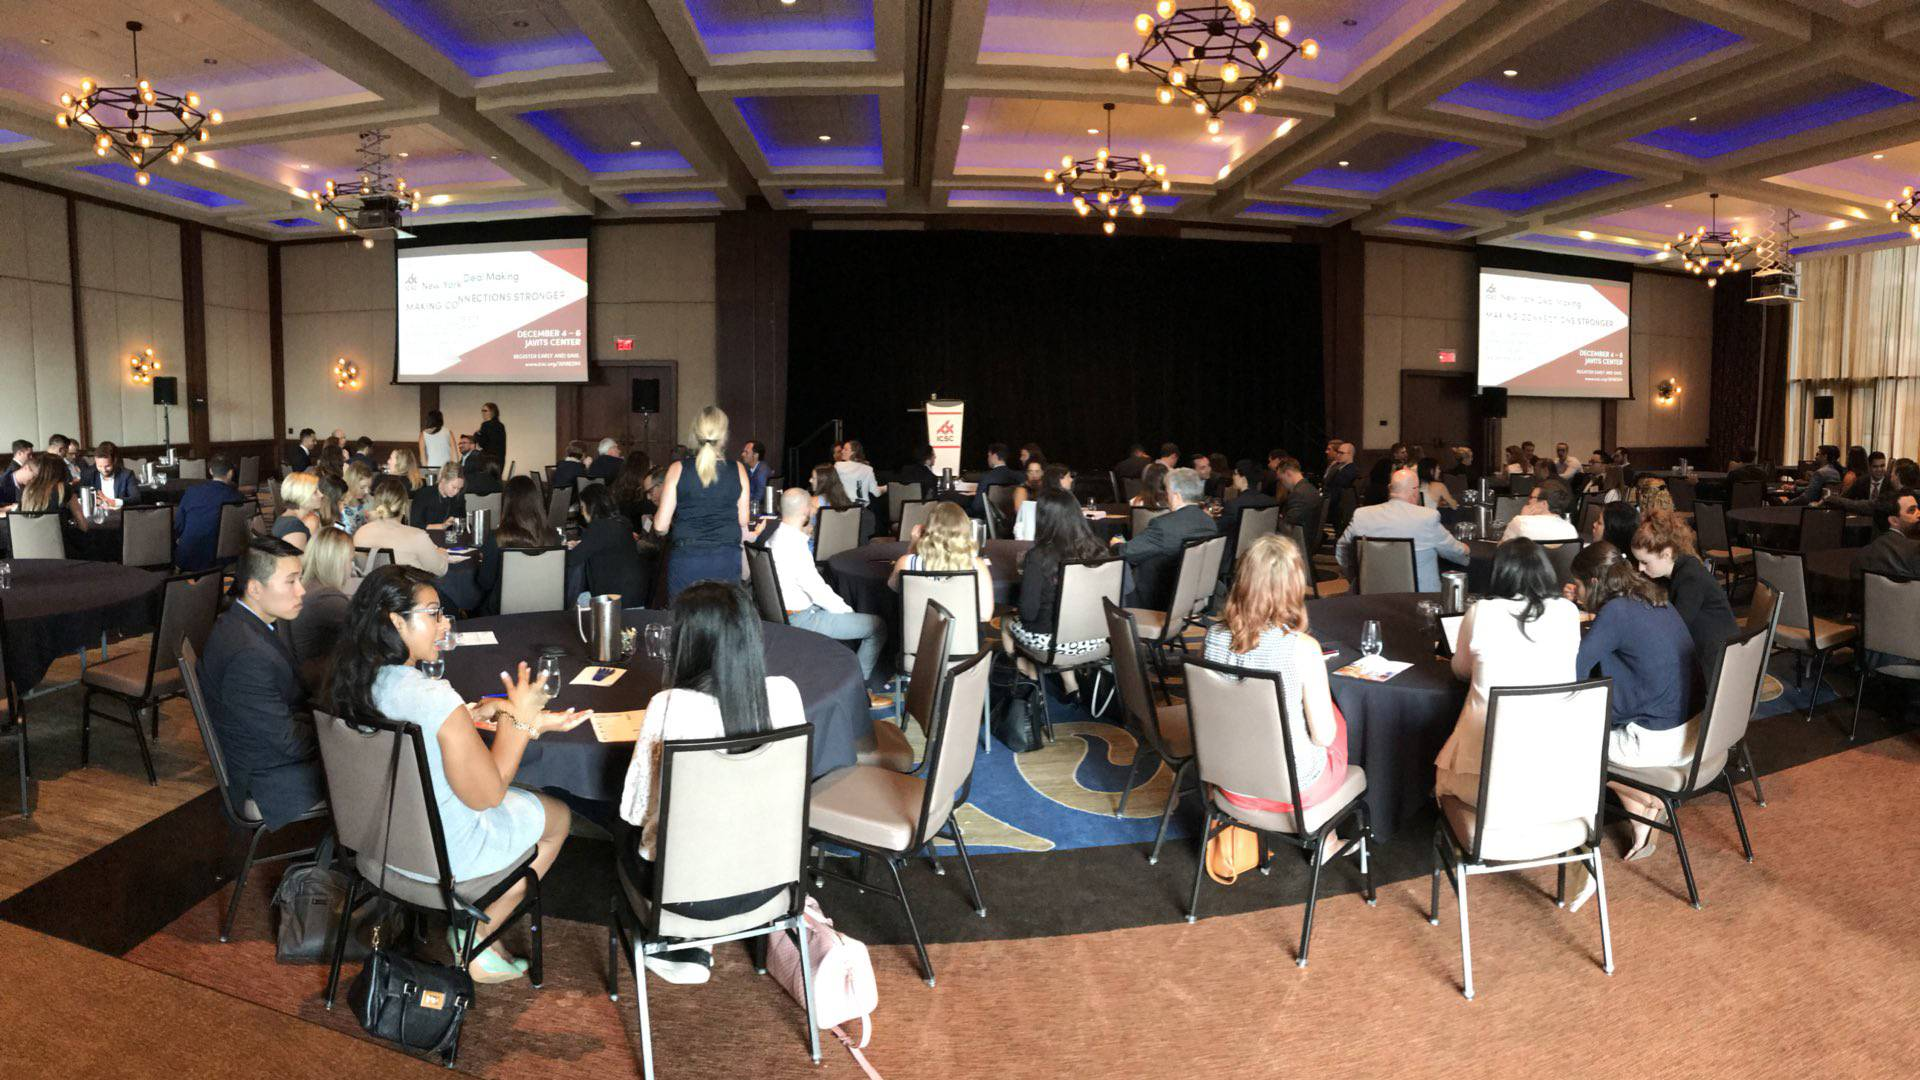 NextGen Conference Honors 4 Under 40